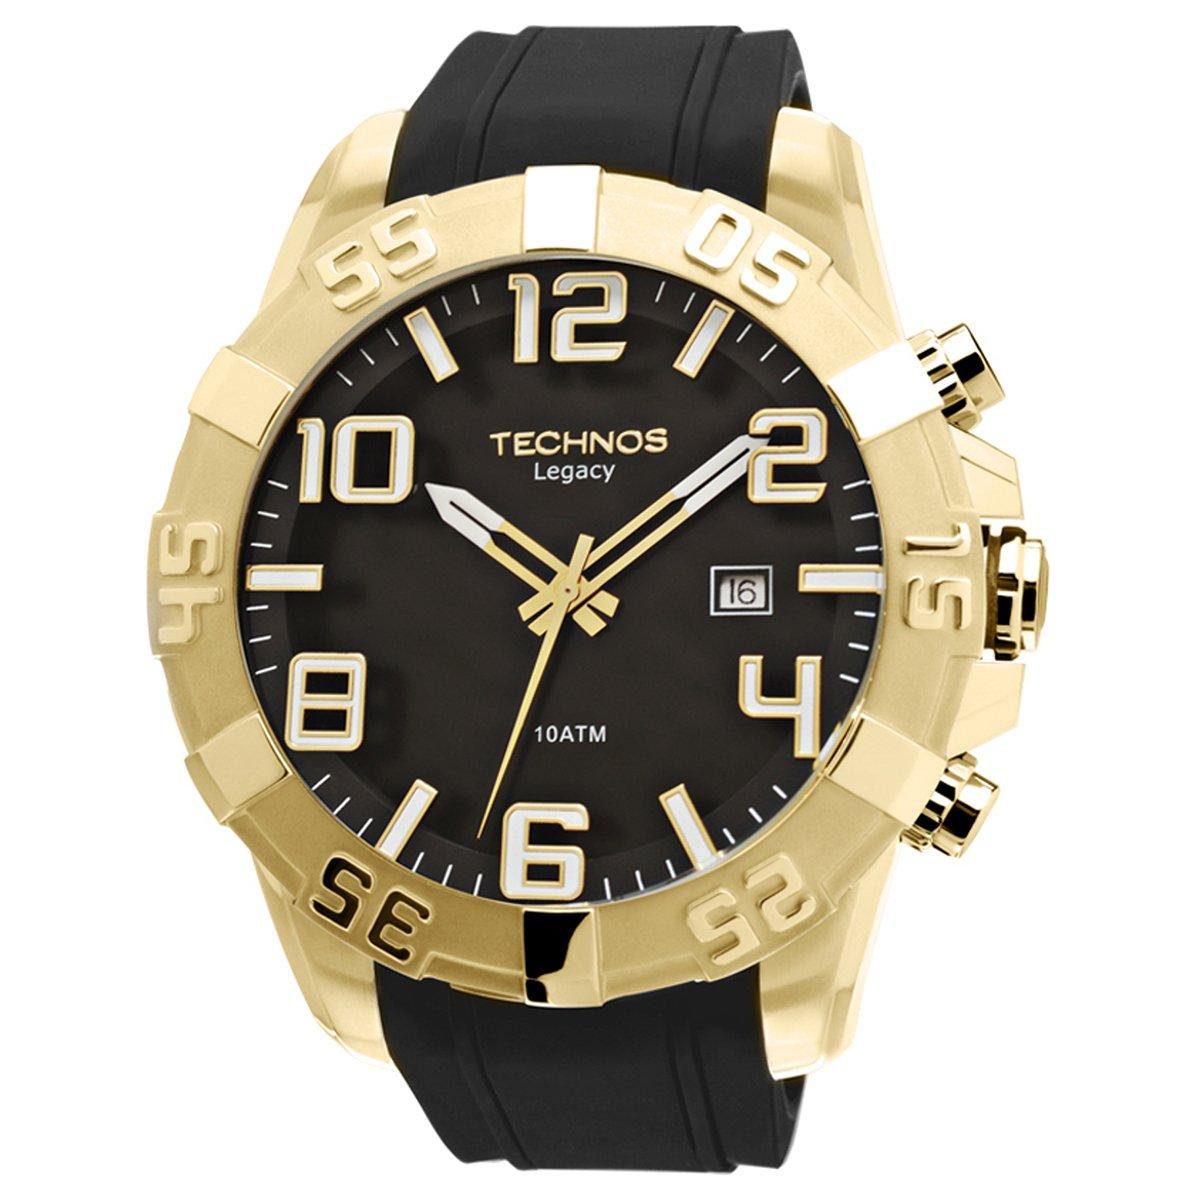 b87579c1cdb7e Relógio Technos Legacy - Compre Agora   Zattini